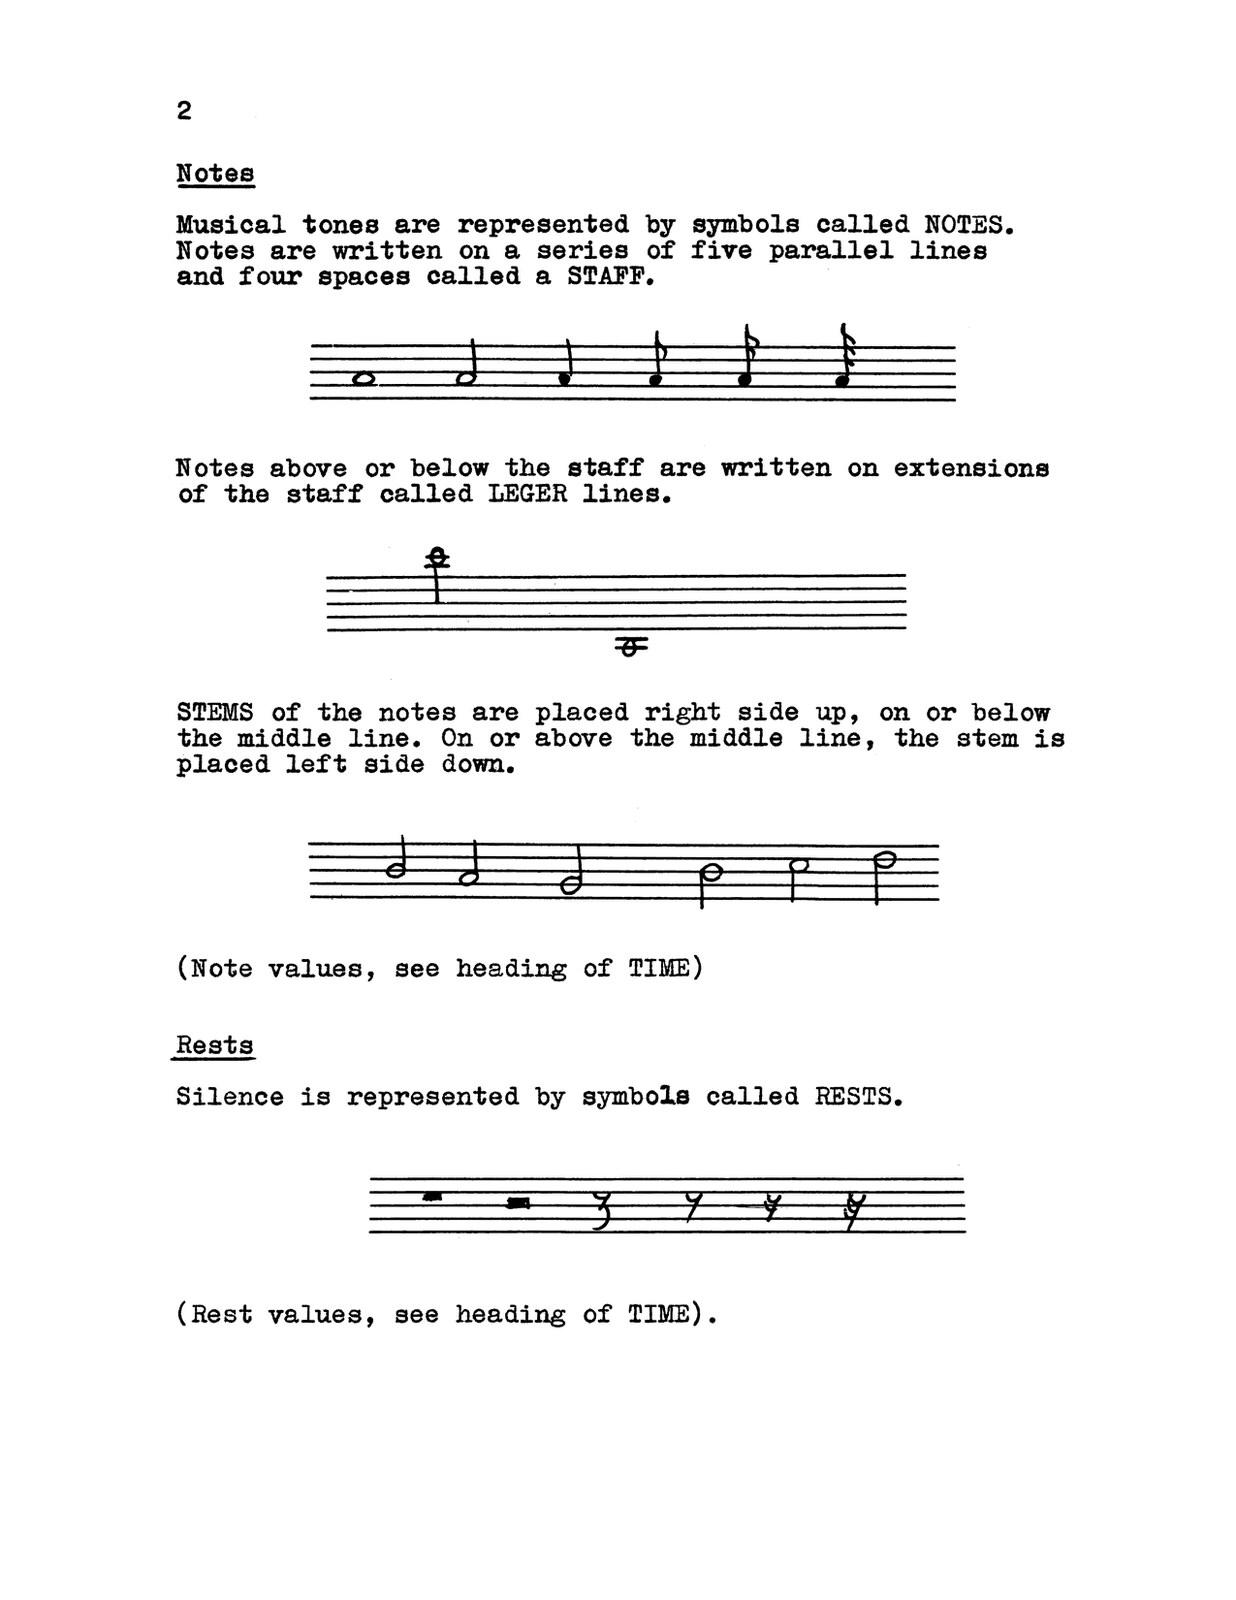 Music primer by sandole adolph qpress sandole music primer p06 buycottarizona